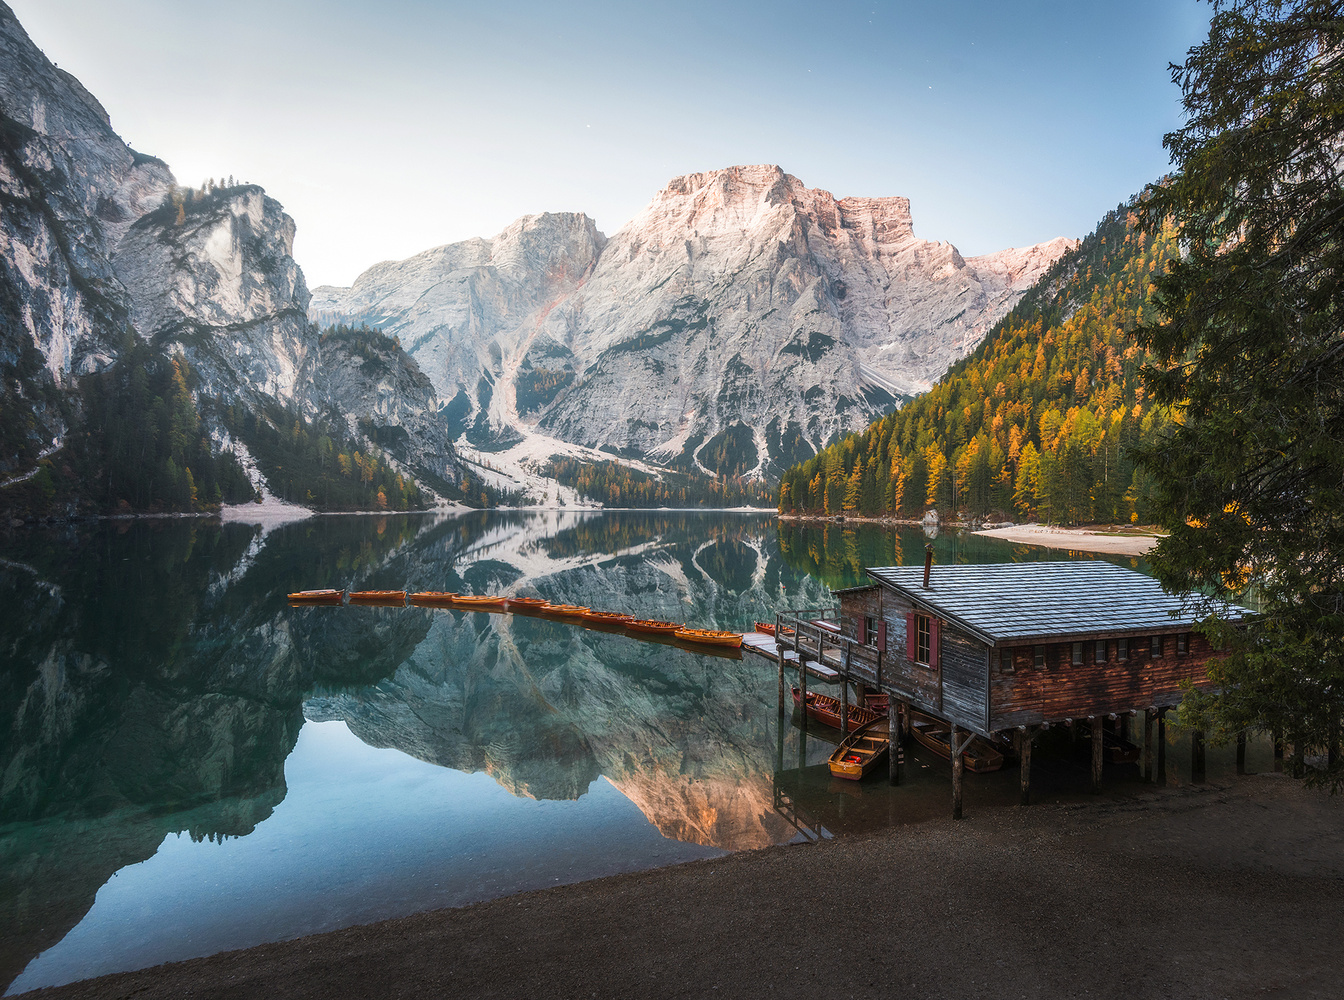 Lago di Braies by Philip Slotte